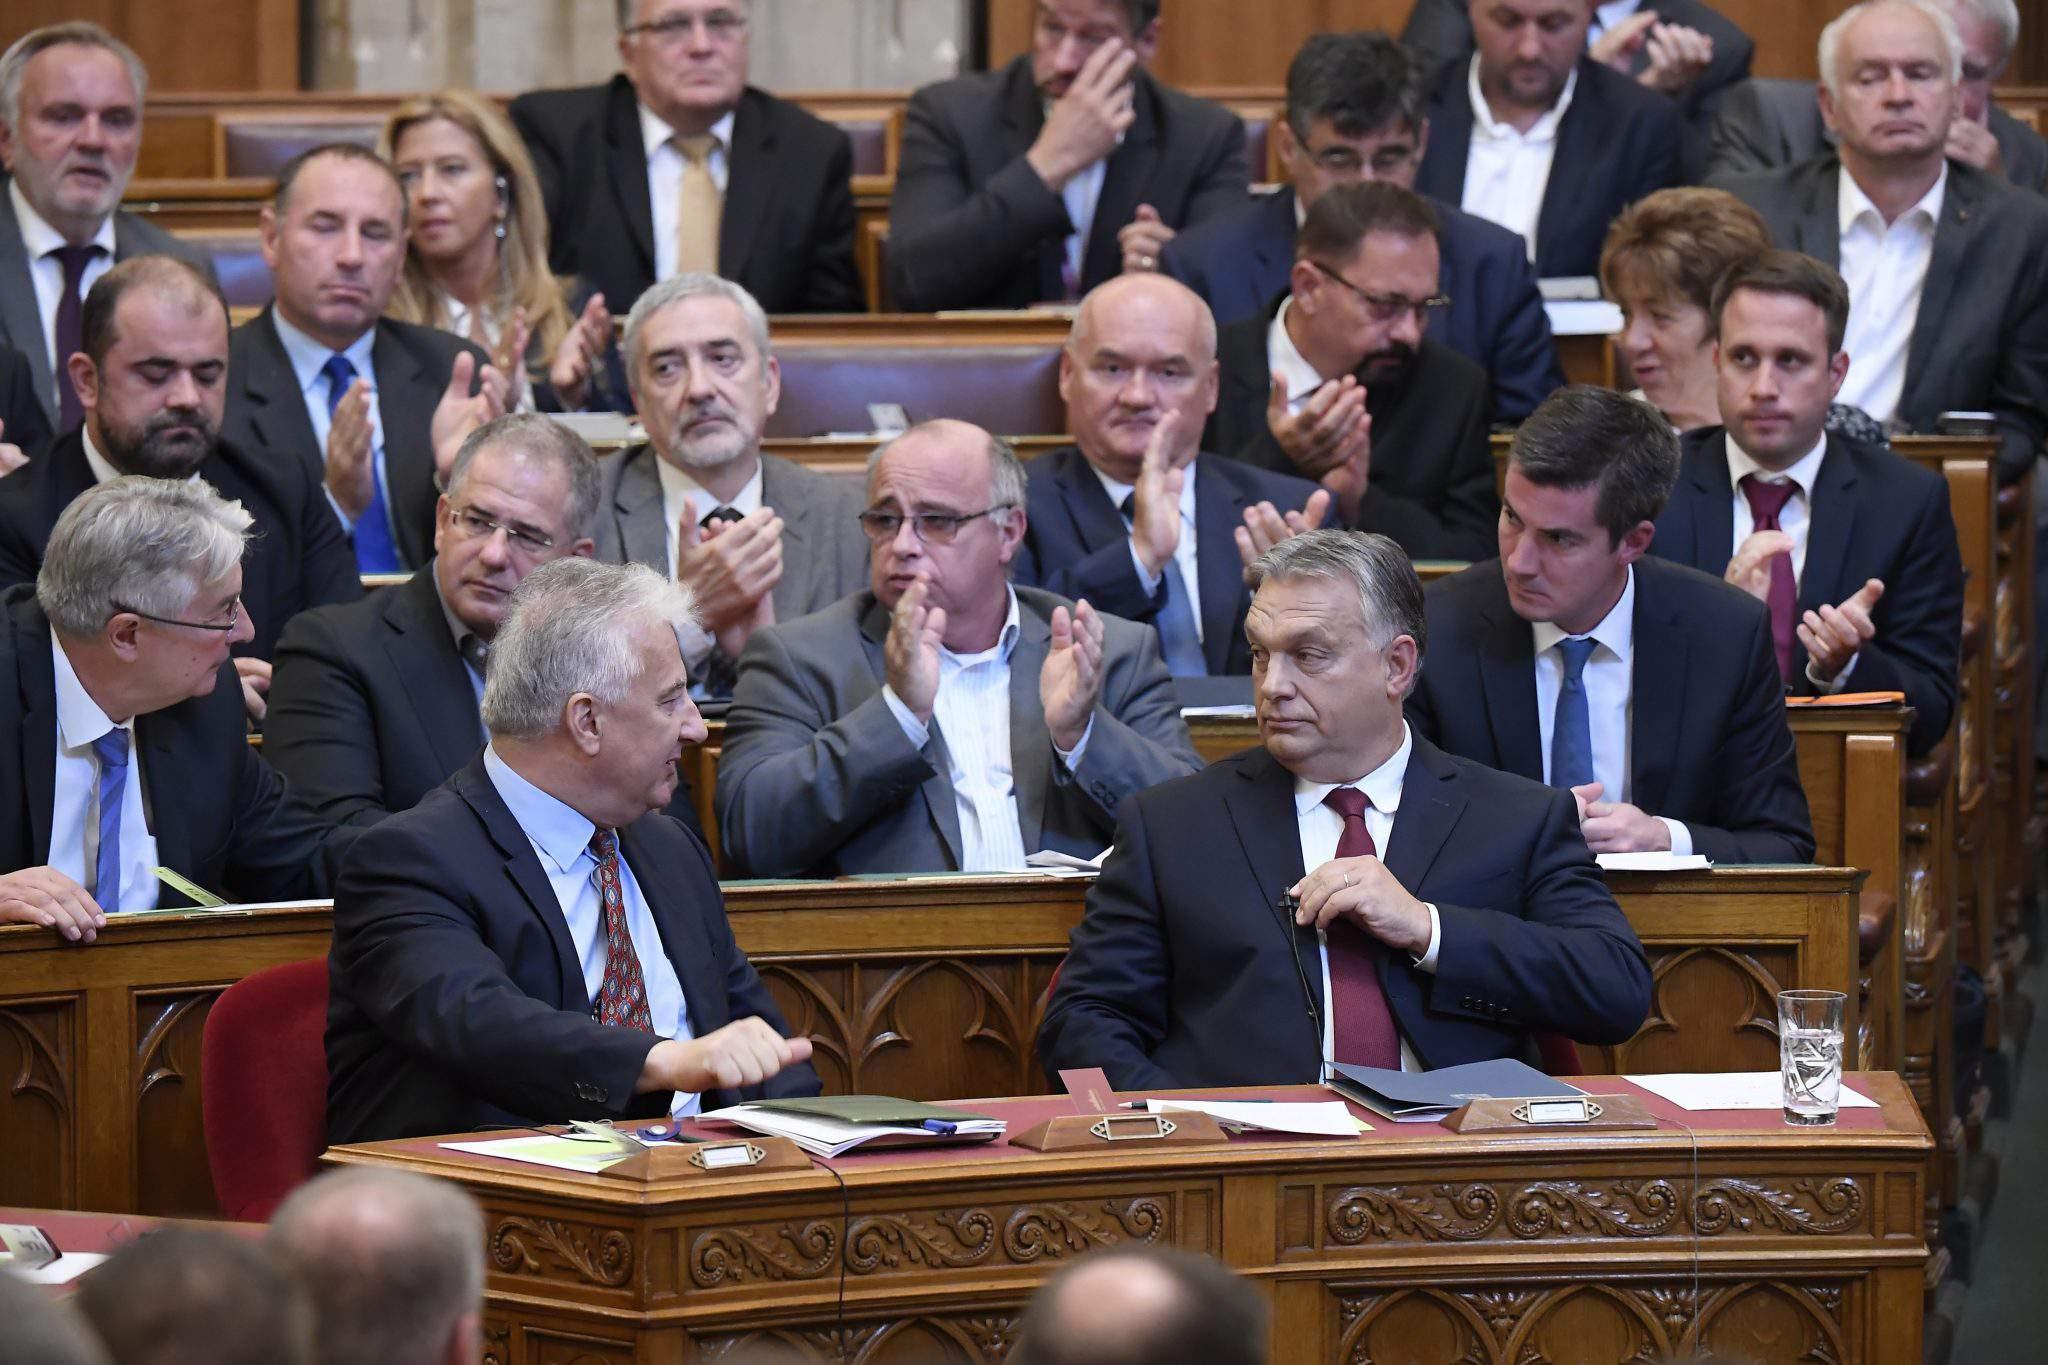 Fidesz in parliament